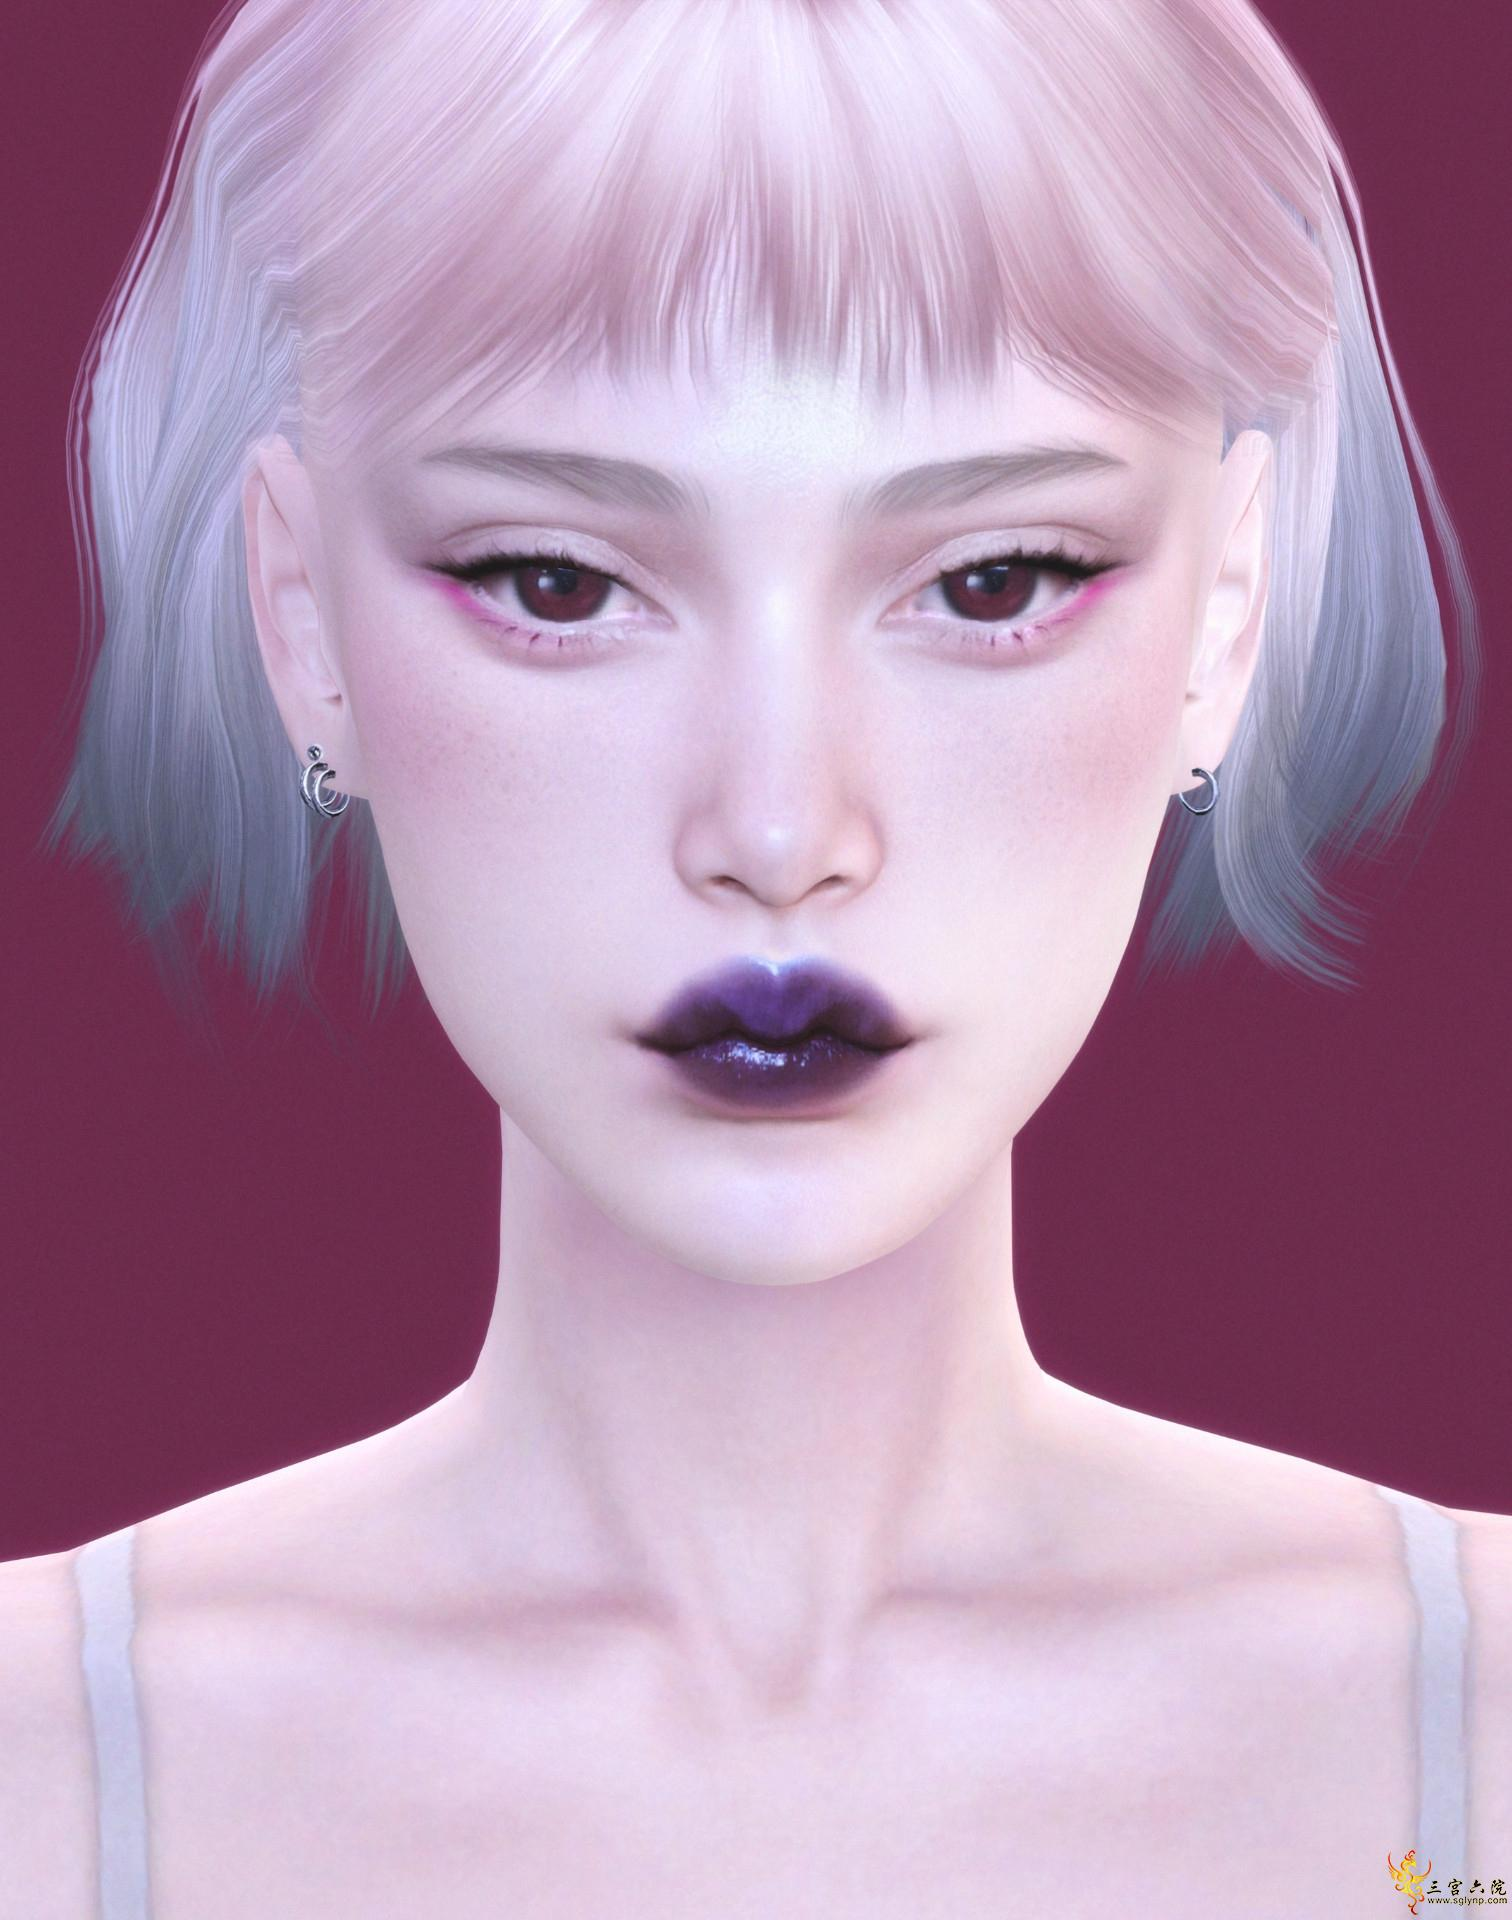 Sims 4 Screenshot 2021.05.30 - 20.07.11.43 копия.png